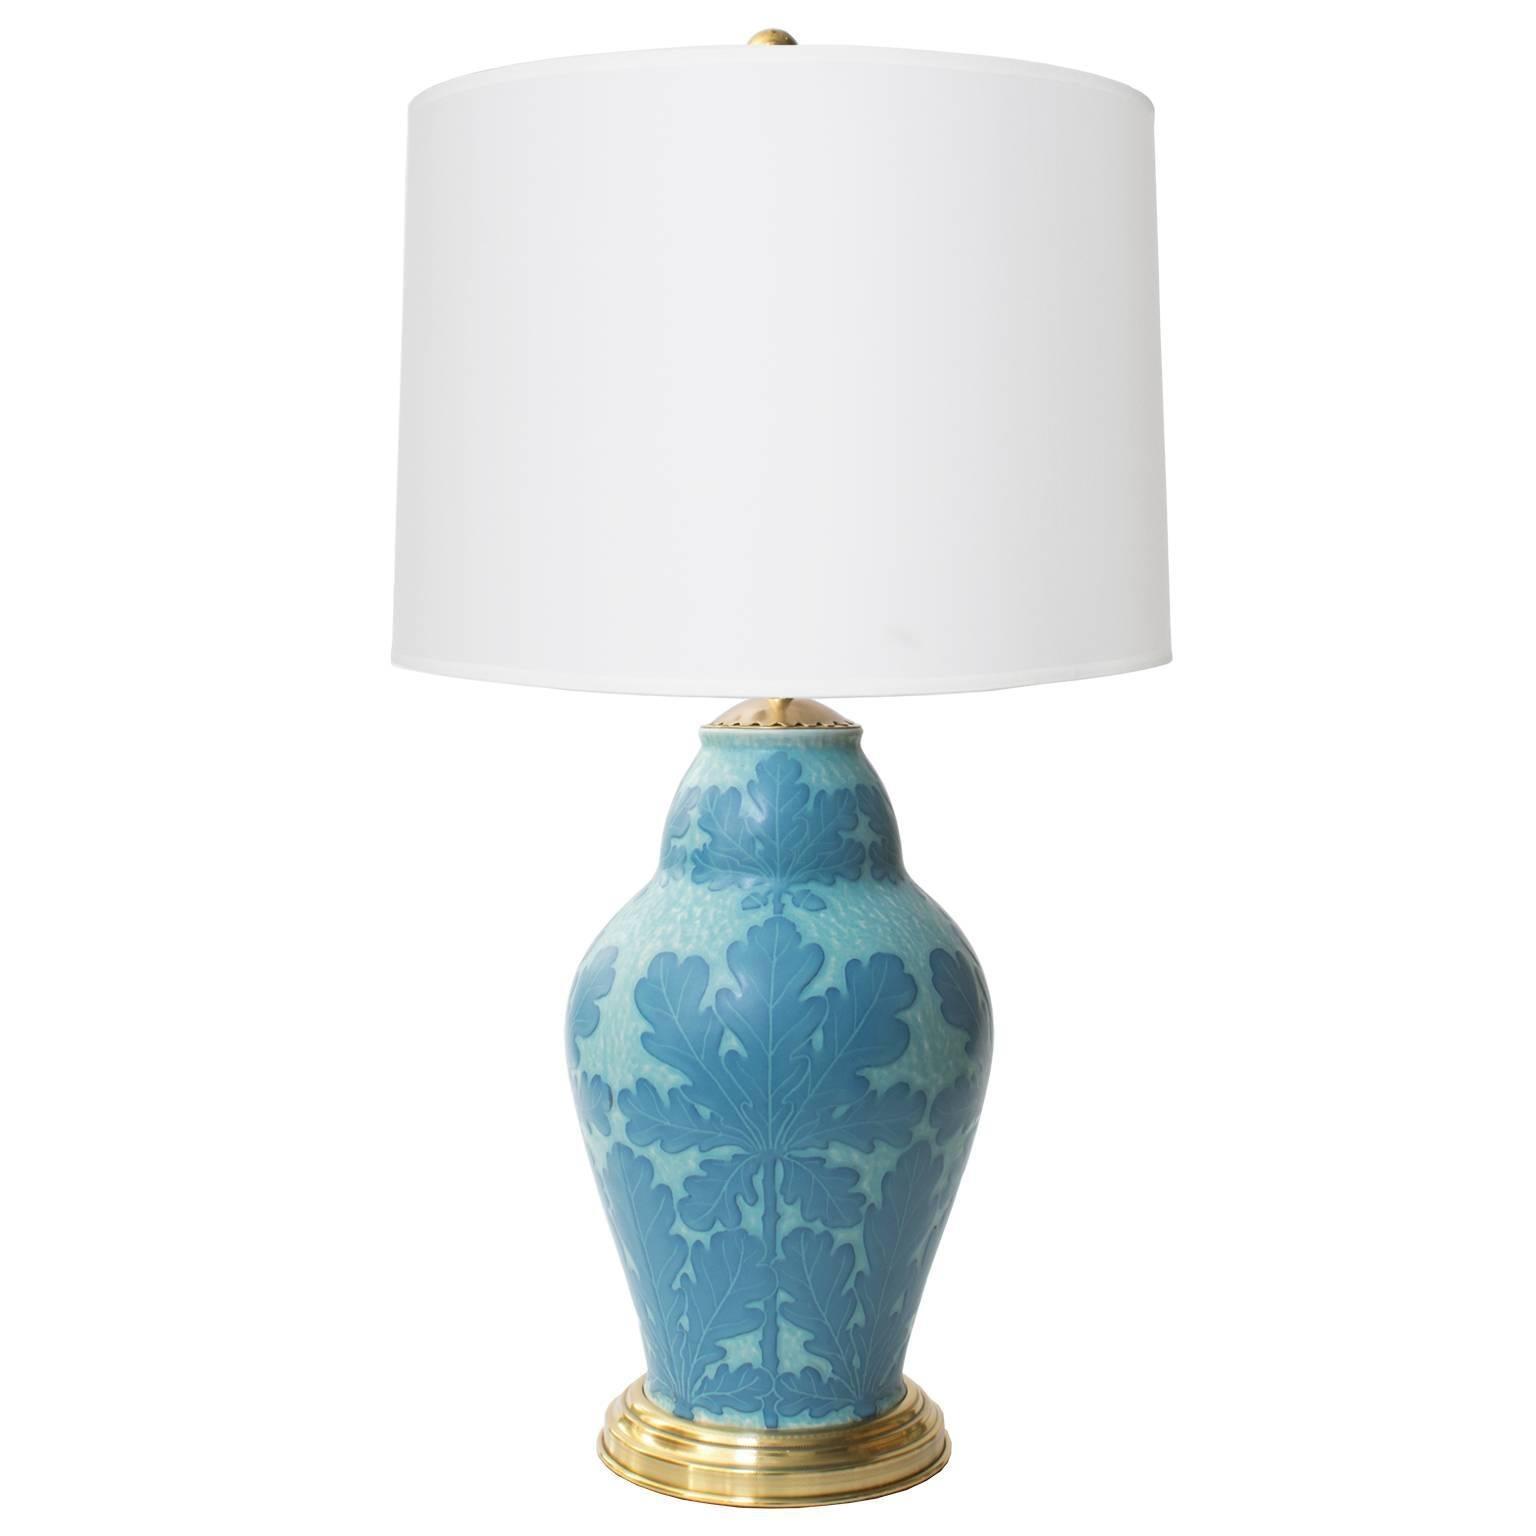 Scandinavian Modern Josef Ekberg Art Deco Ceramic Lamp with Oak Leaf Motif